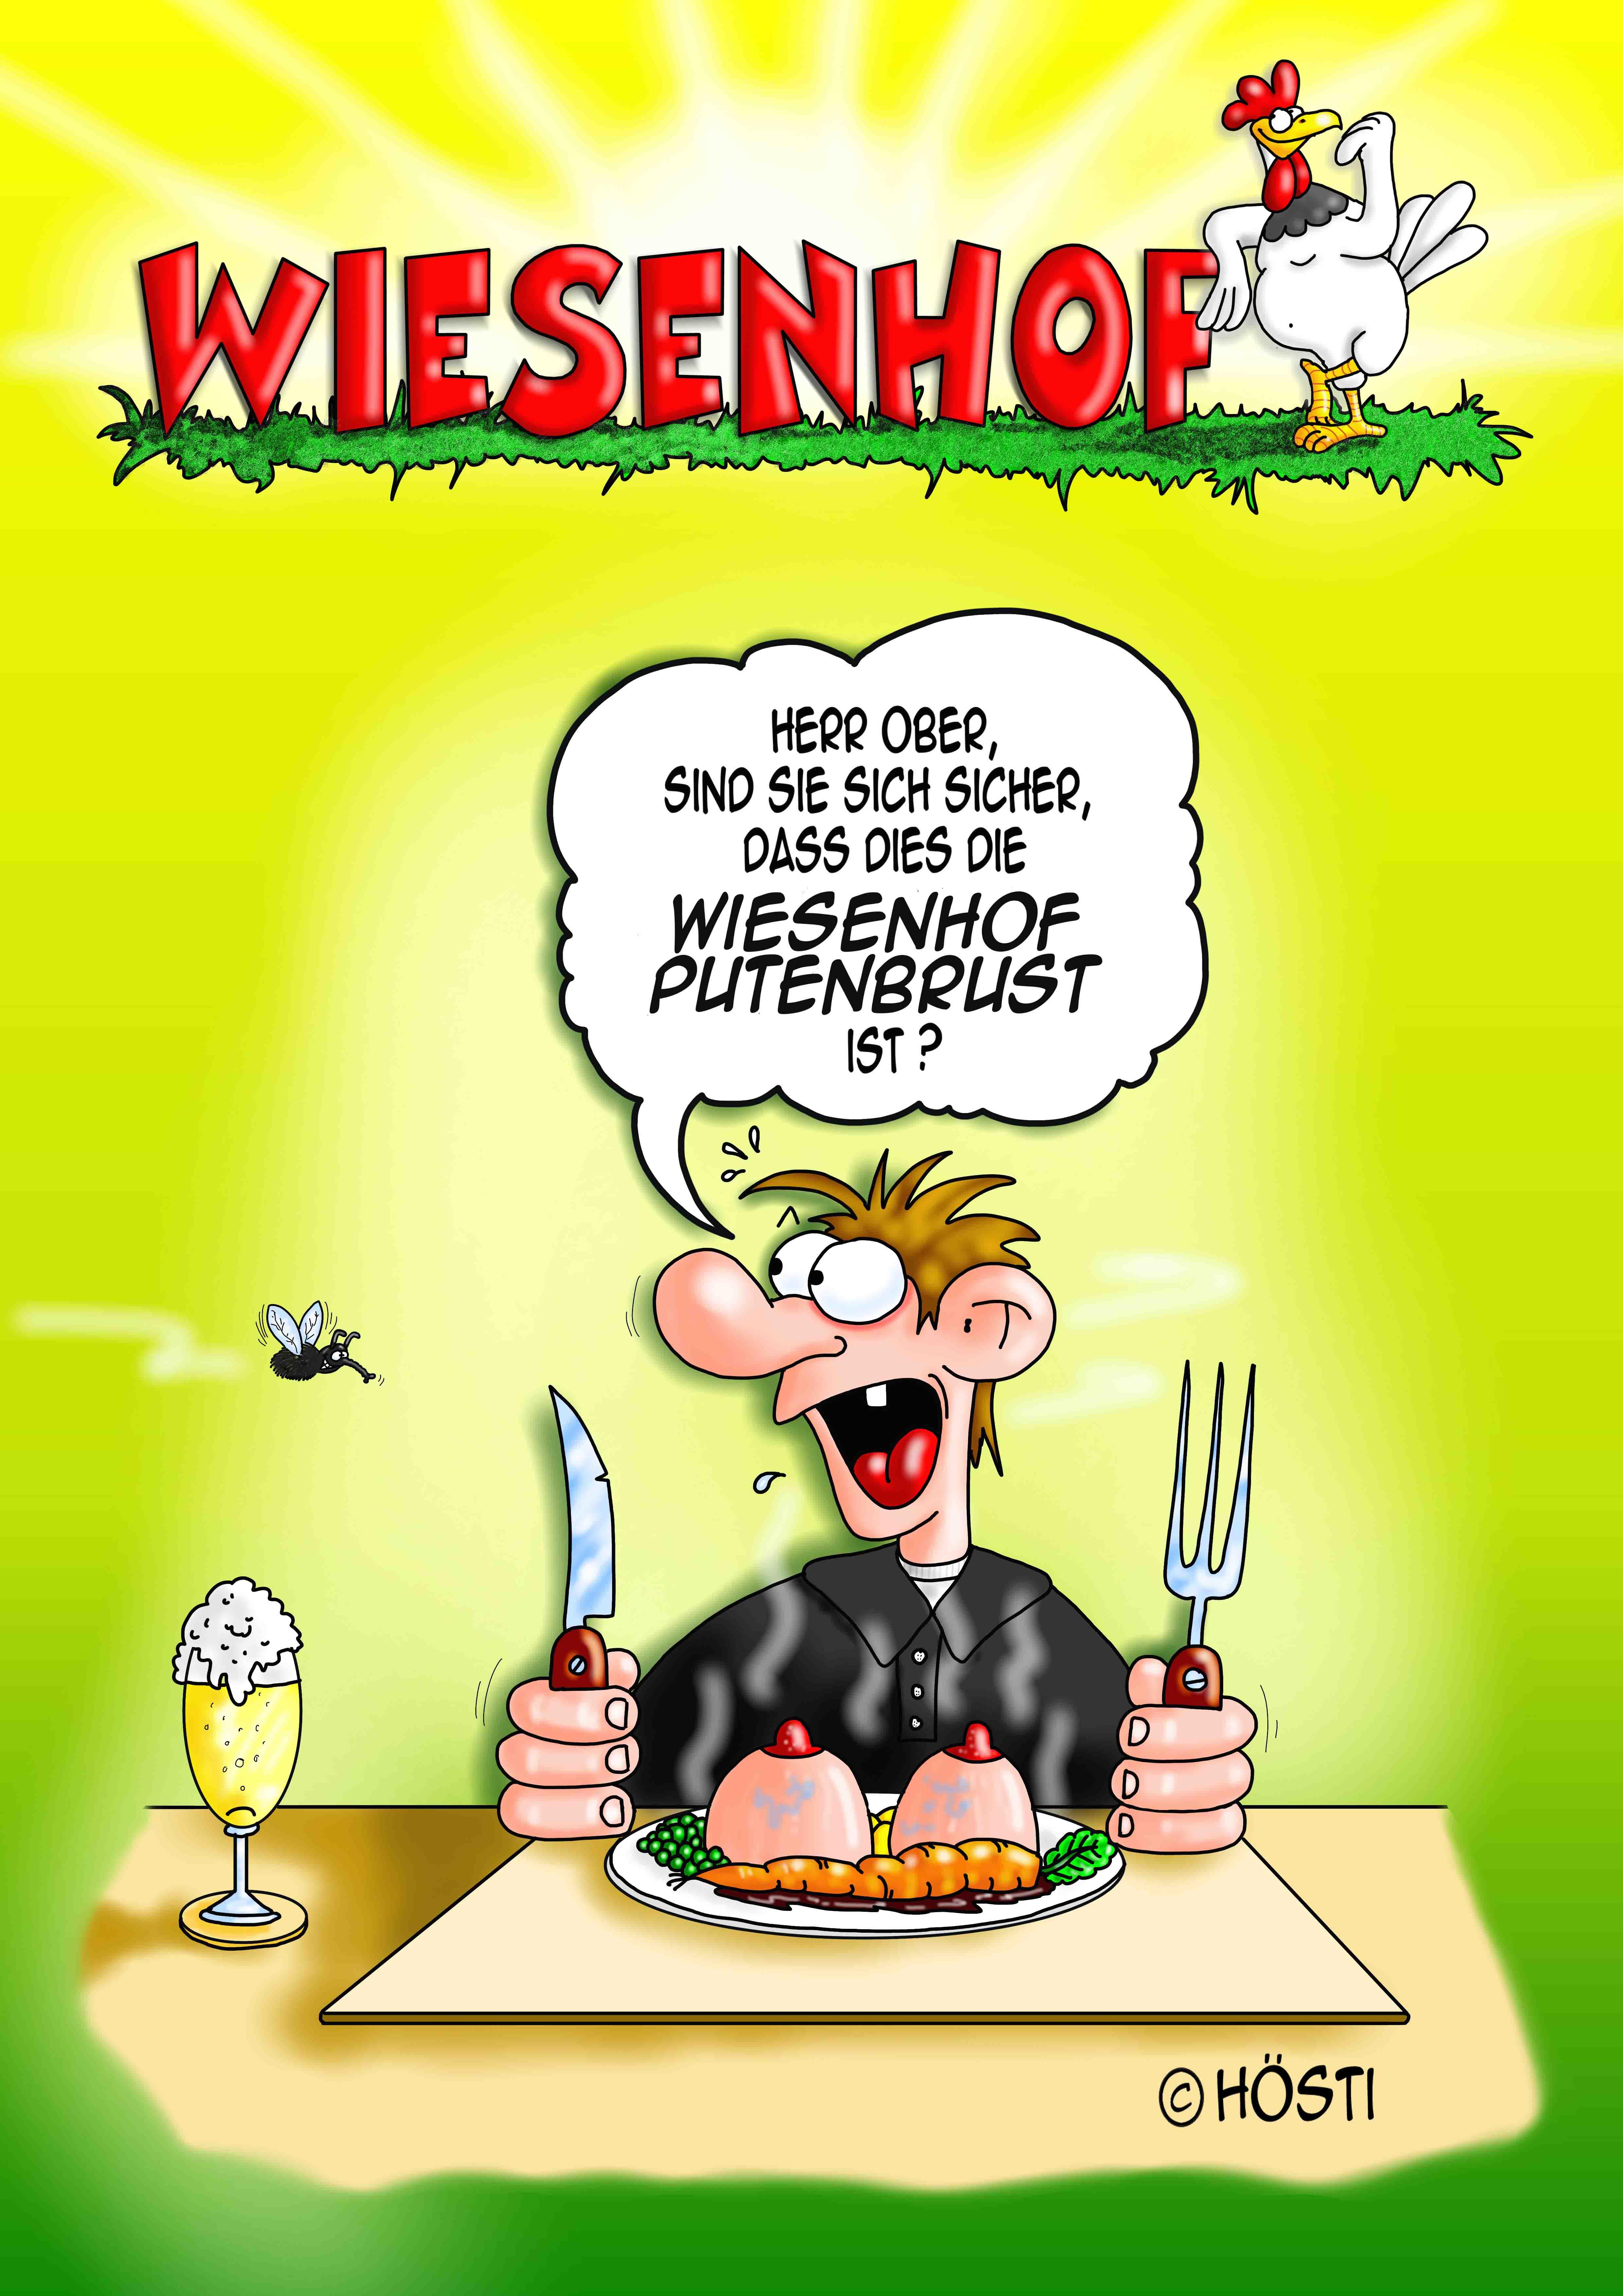 Bild Wiesenhof 2 abg